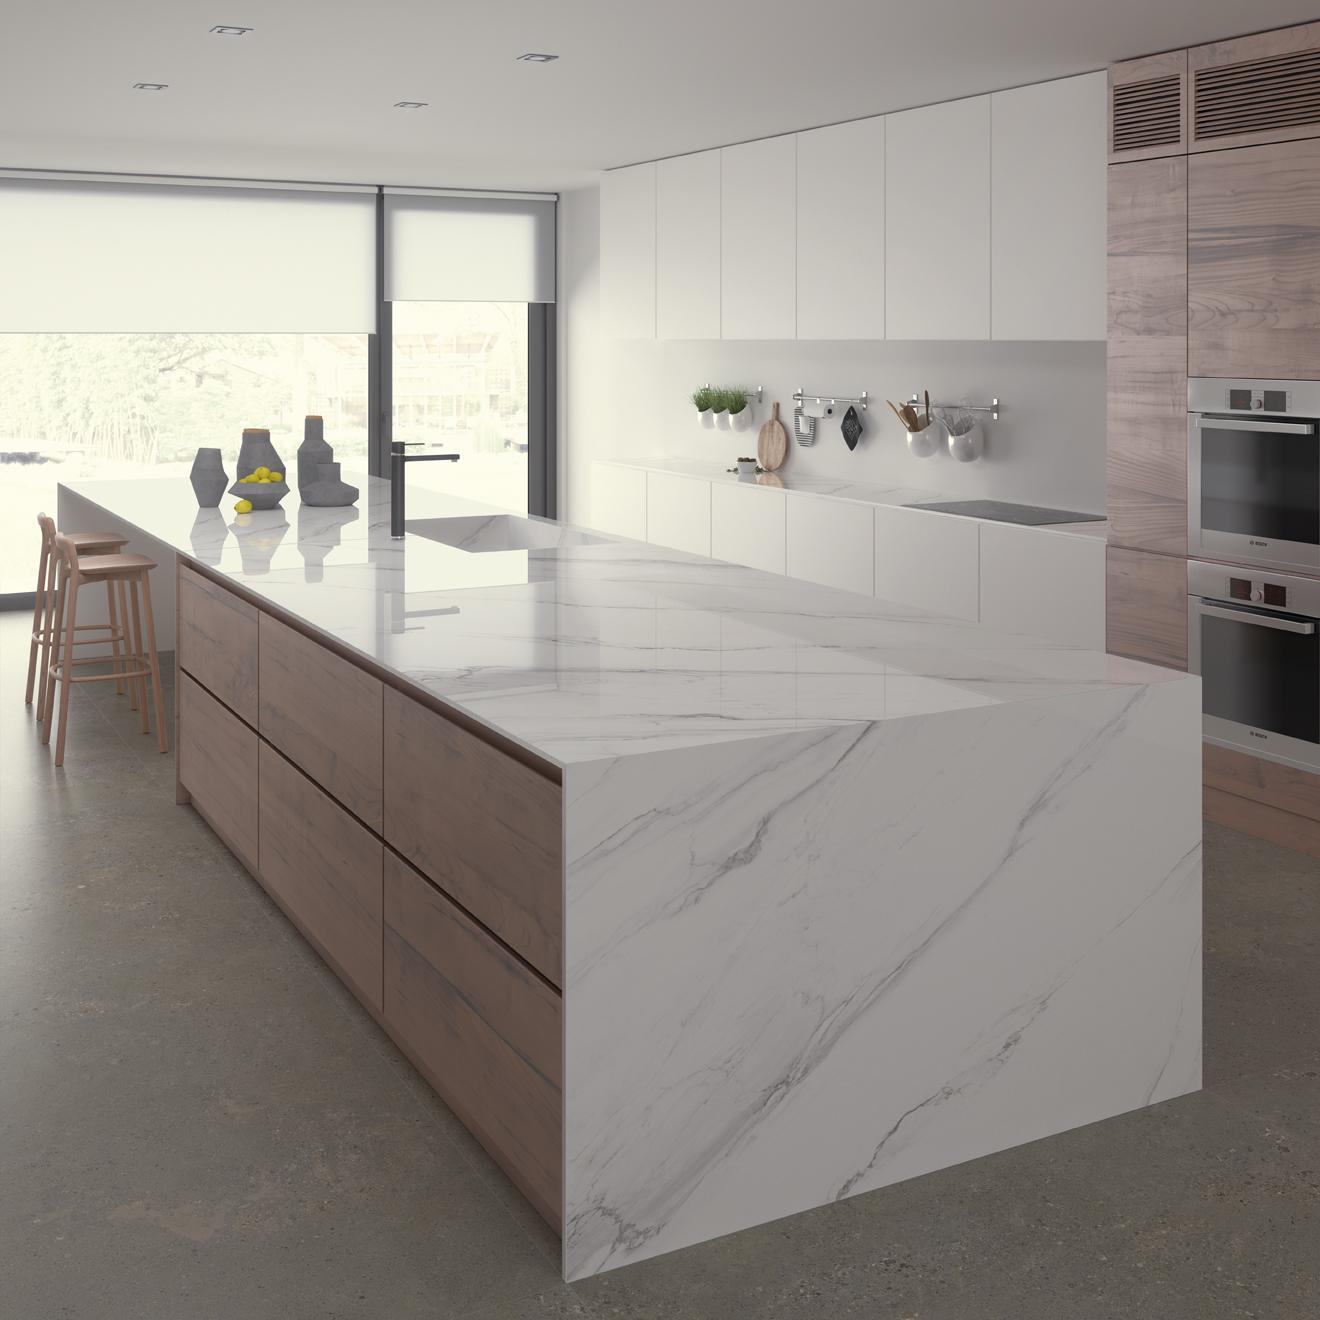 Keuken met kookeiland met marmer 'look'. Keramisch werkblad Ceramistone Bright Marble van Kemie #keuken #marmer #kookeiland #trend